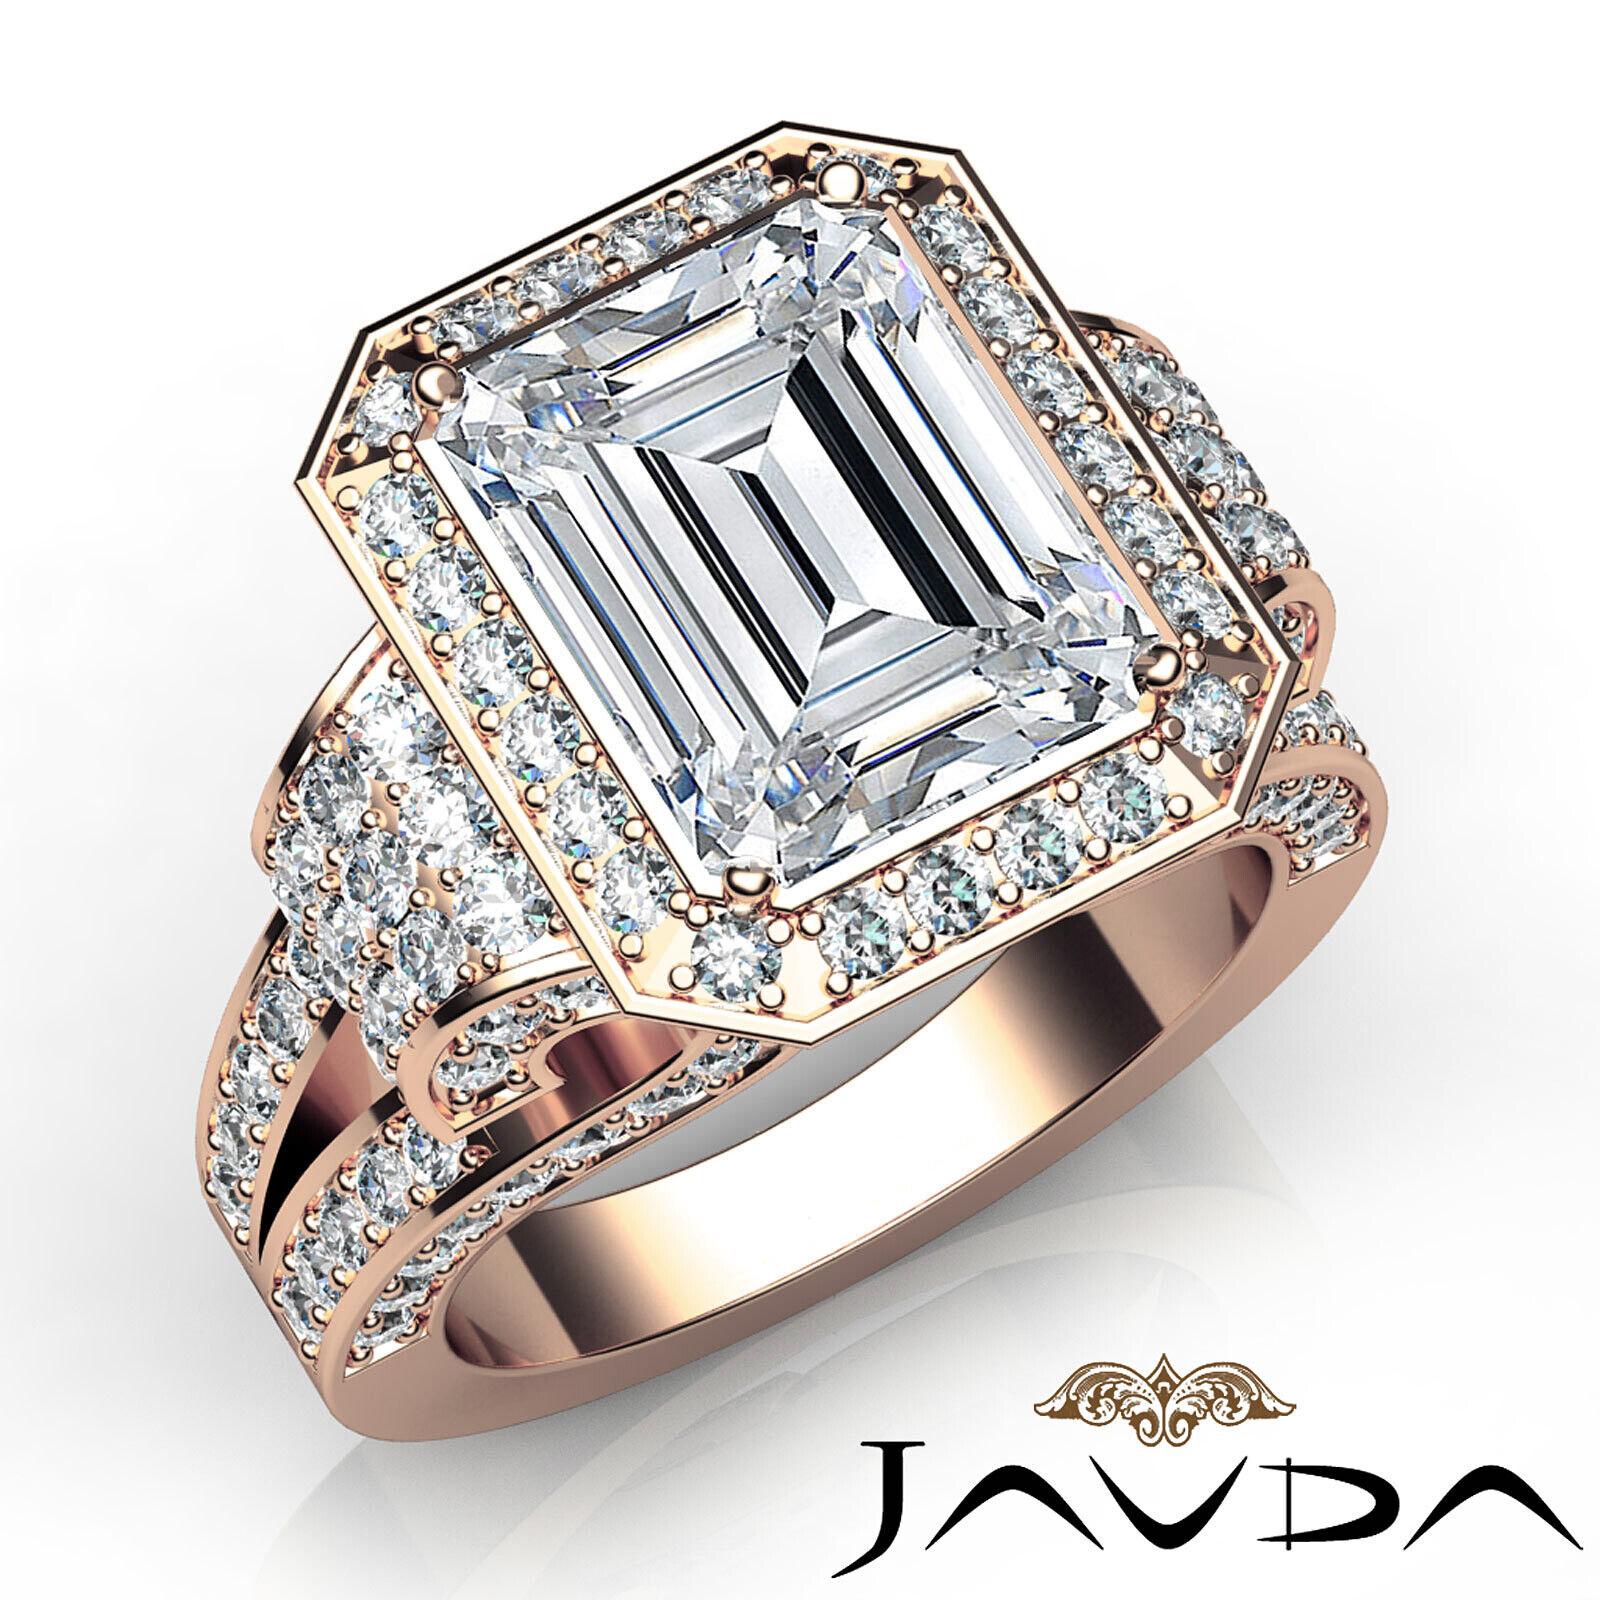 4.4ctw Antique Vintage Halo Emerald Diamond Engagement Ring GIA I-VS1 White Gold 10